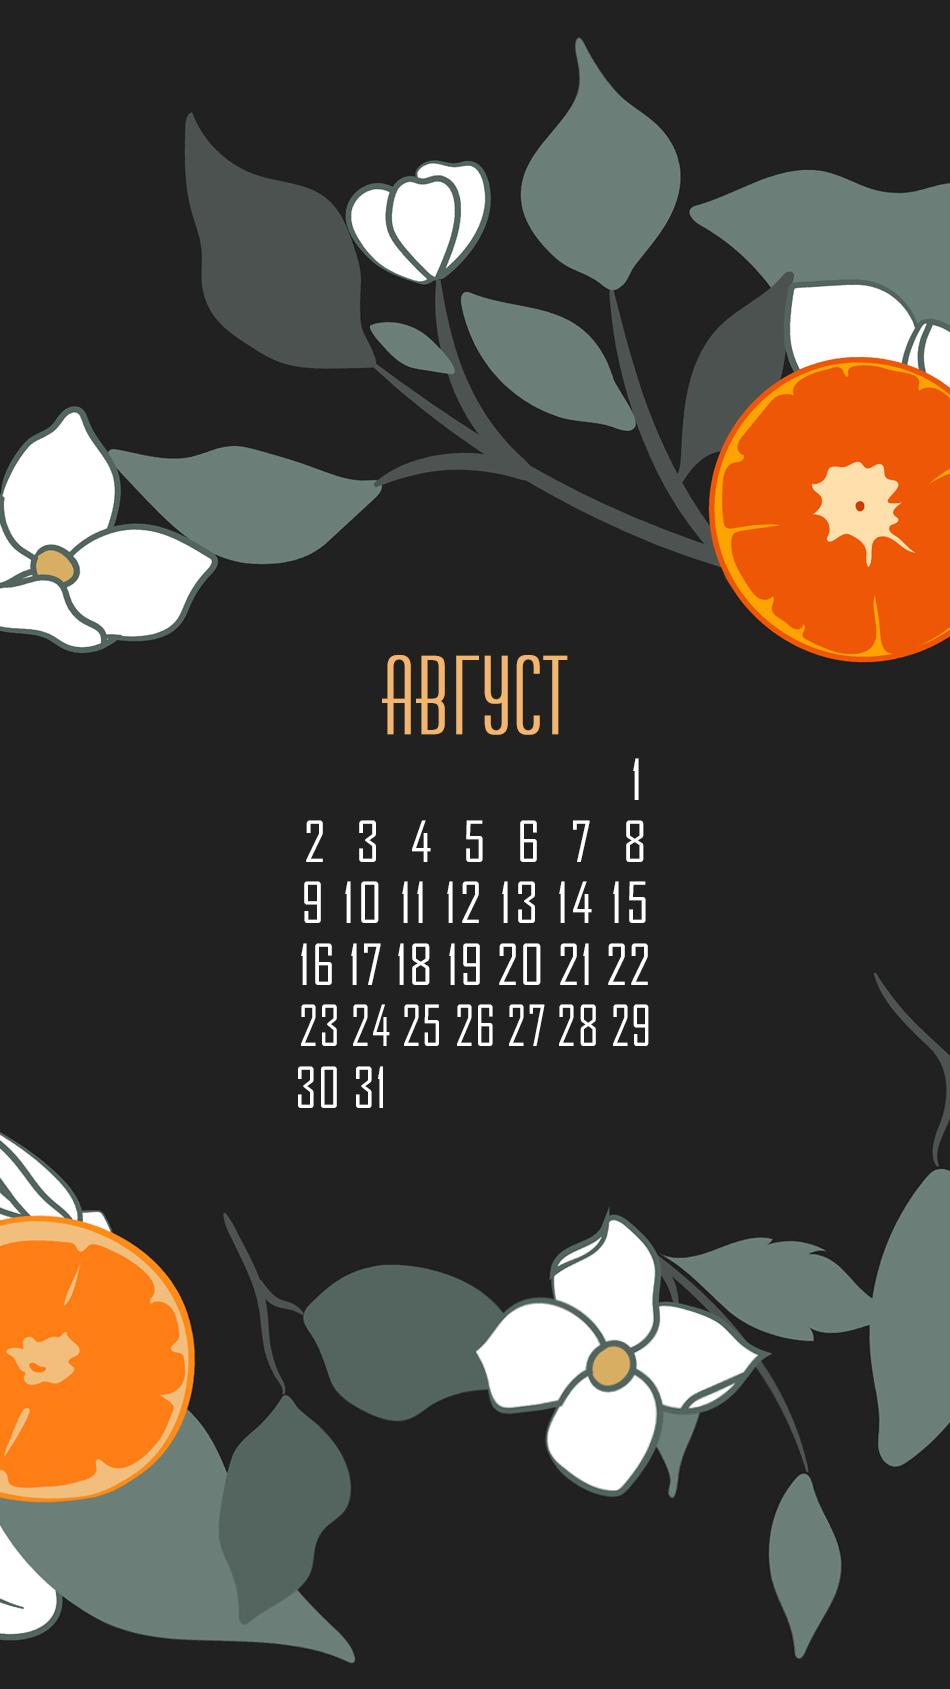 календарь на август 3 district-f.org